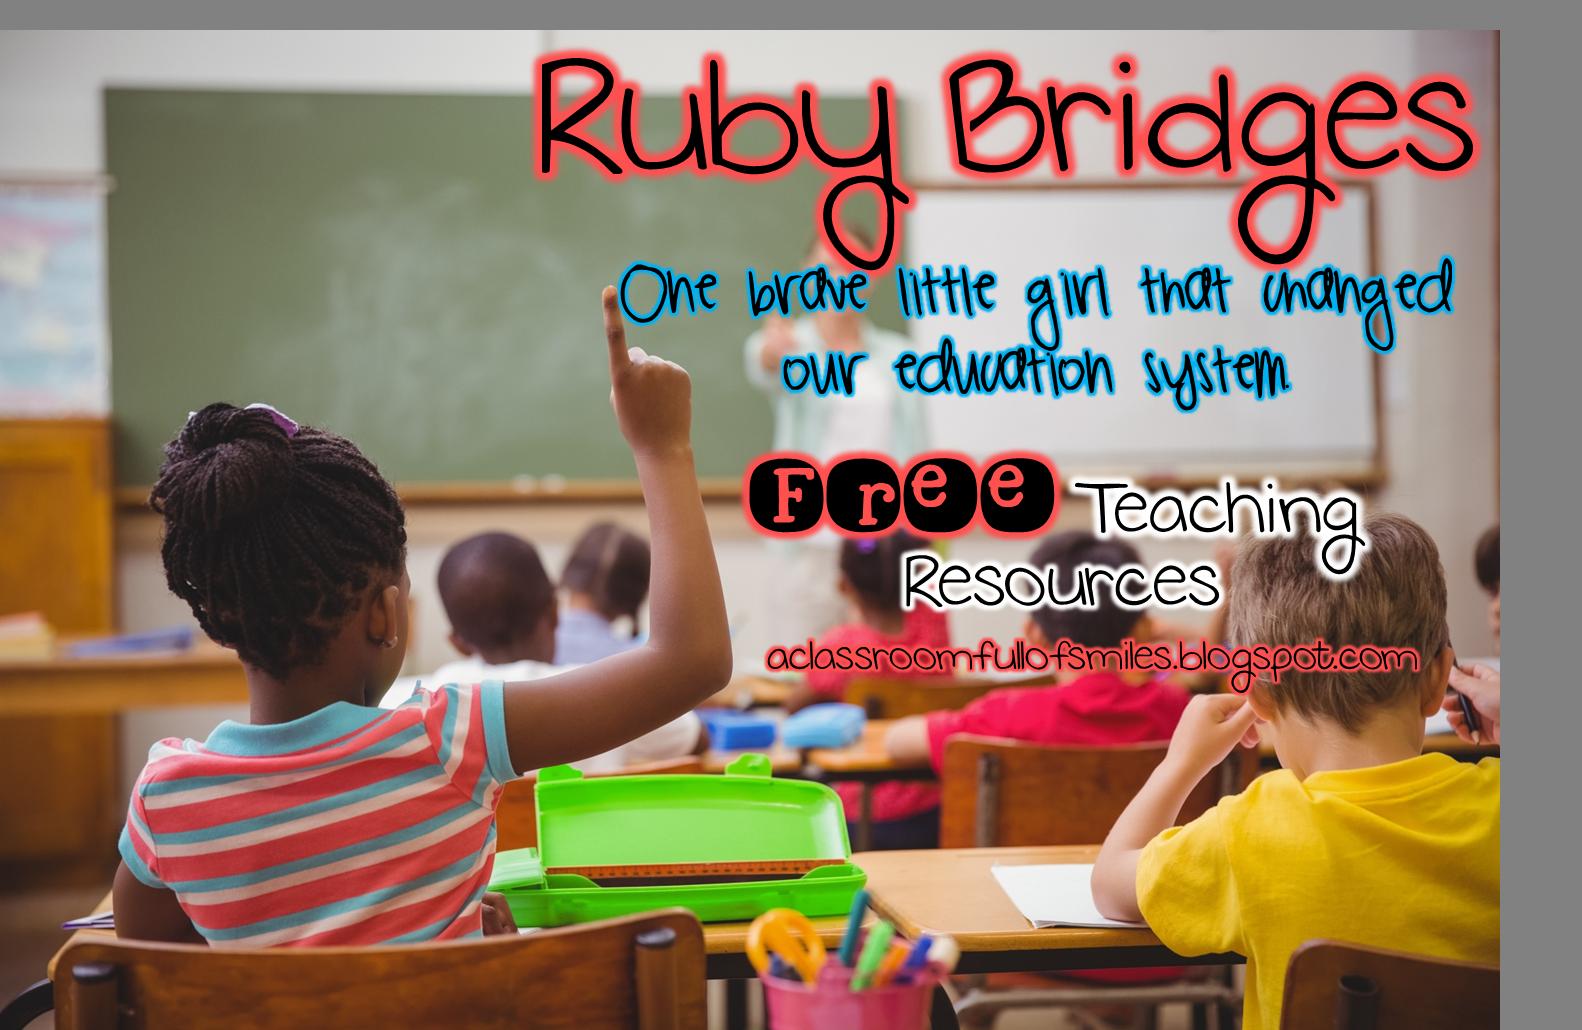 Free Teaching Ideas For Ruby Bridges